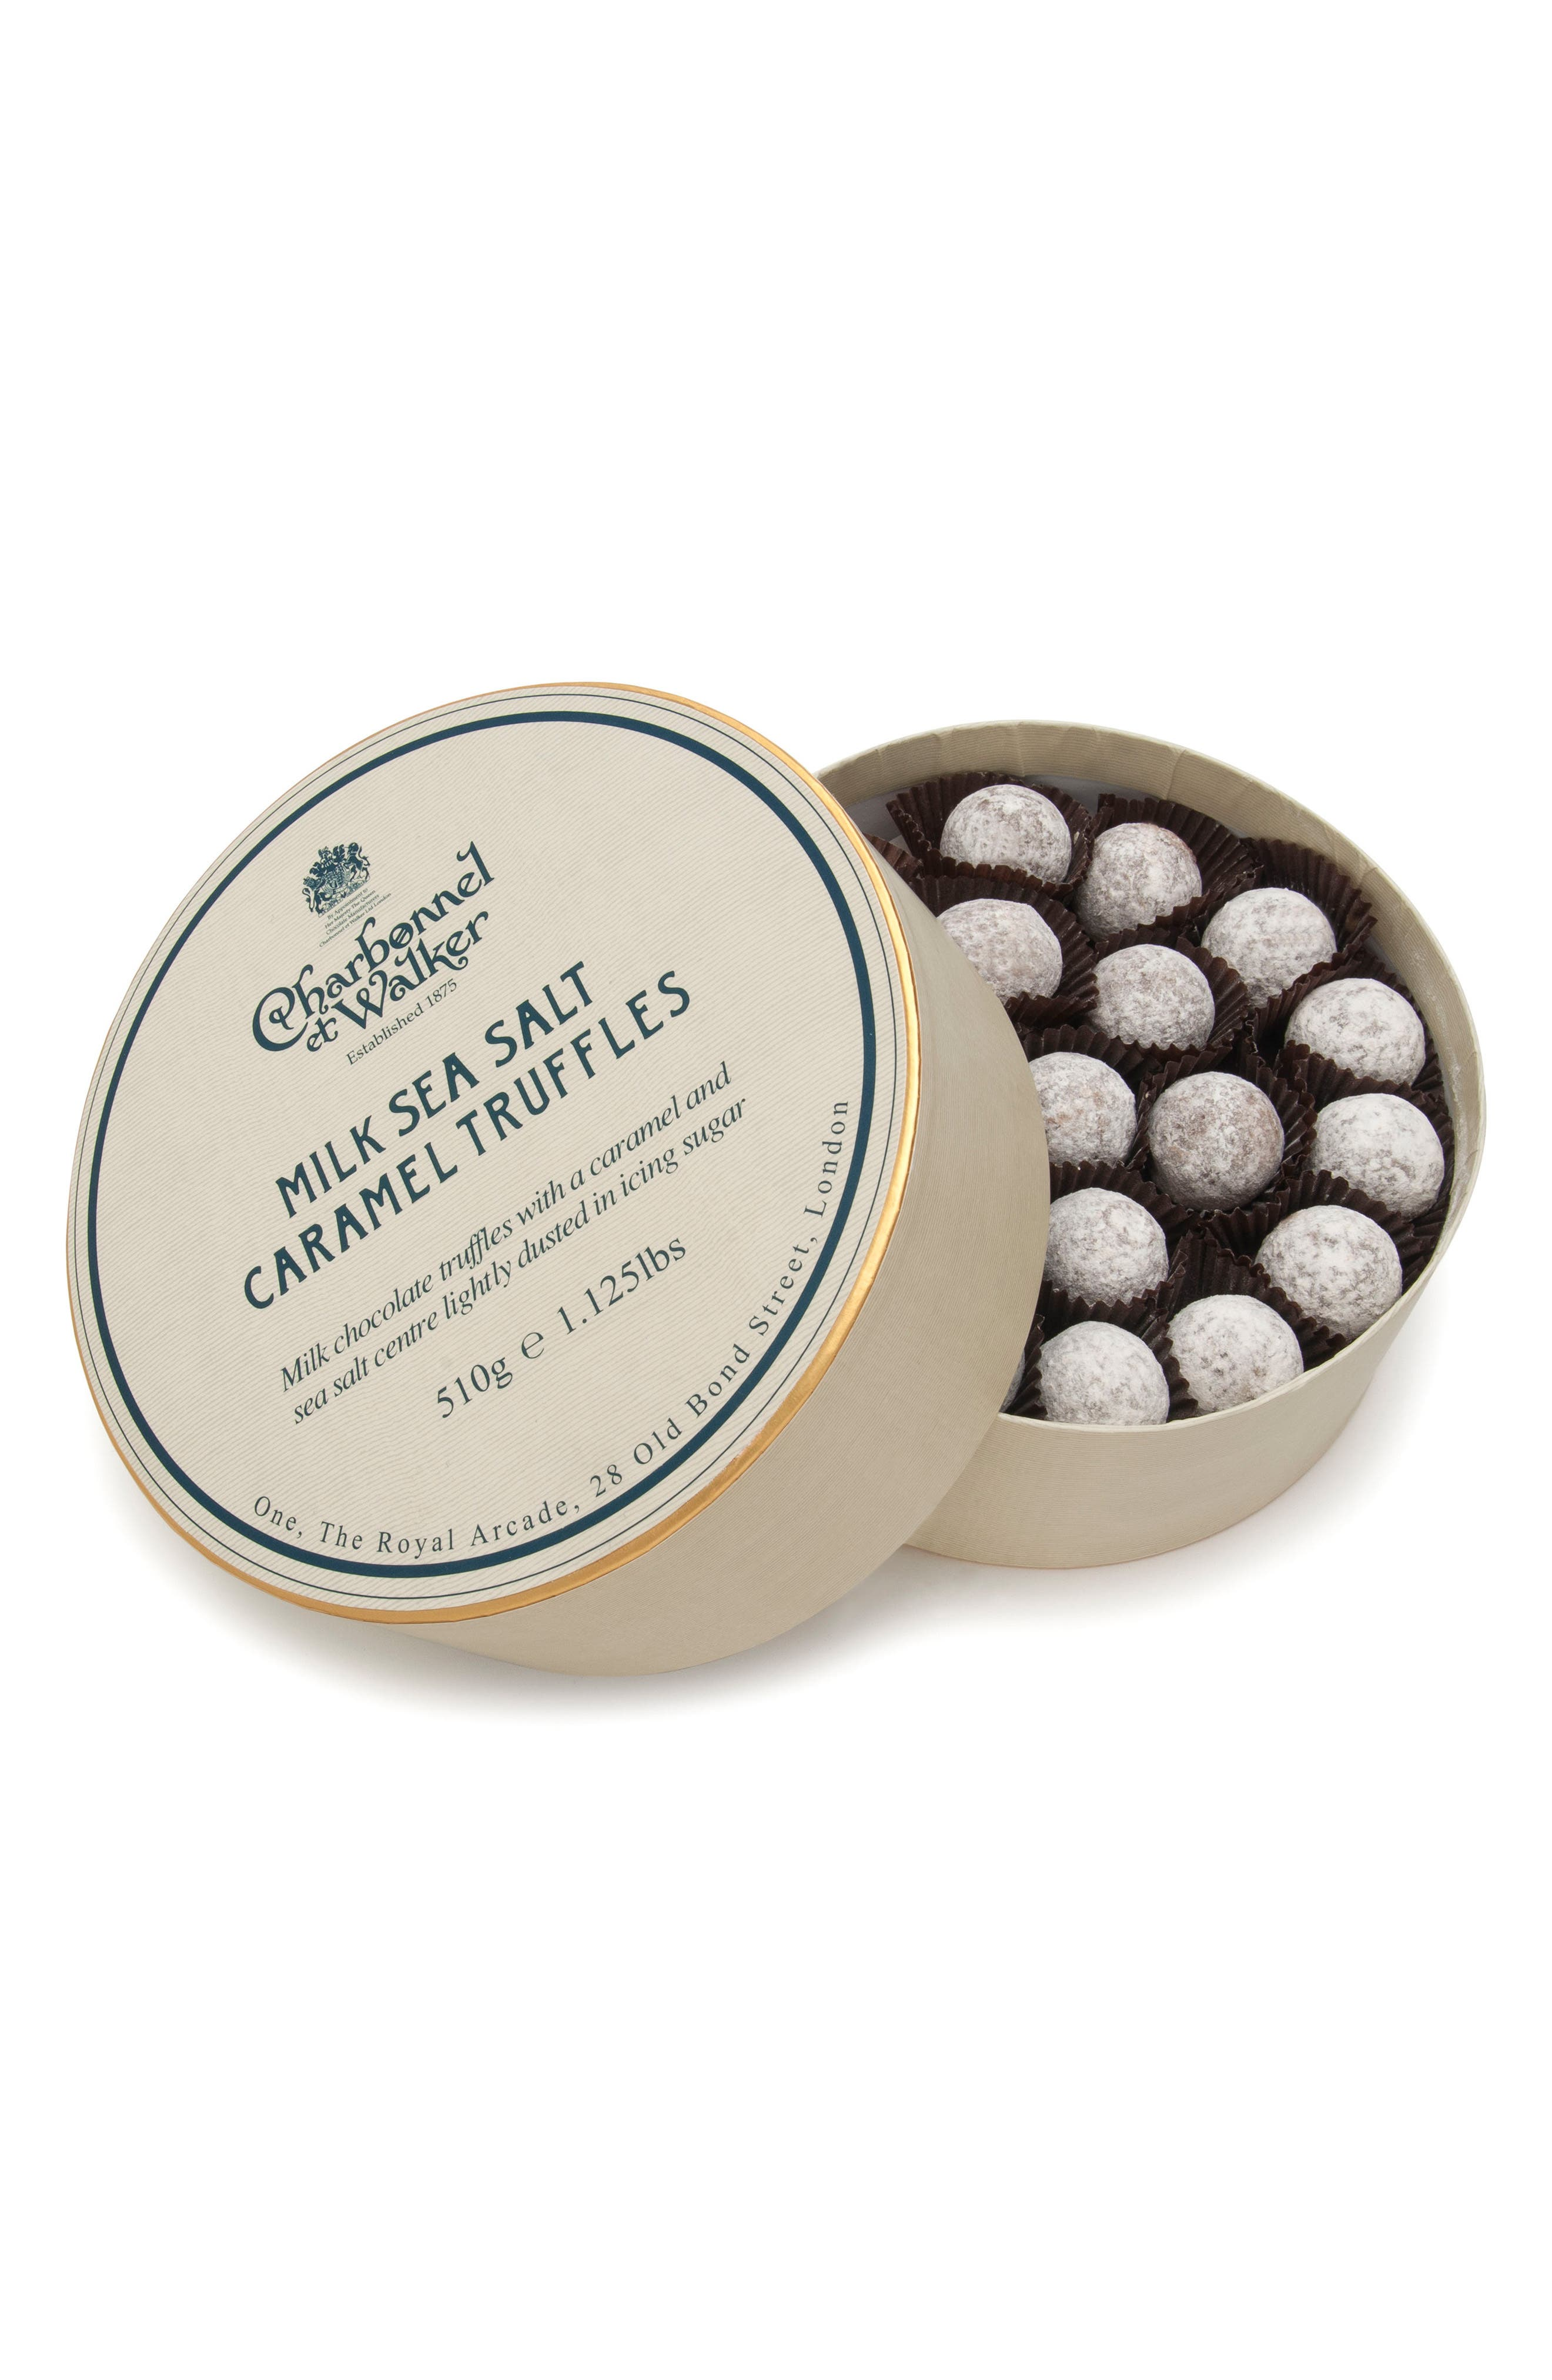 Sea Salt Caramel Milk Chocolate Truffles in Double Layer Gift Box,                         Main,                         color, SEA SALT/ MILK CARAMEL